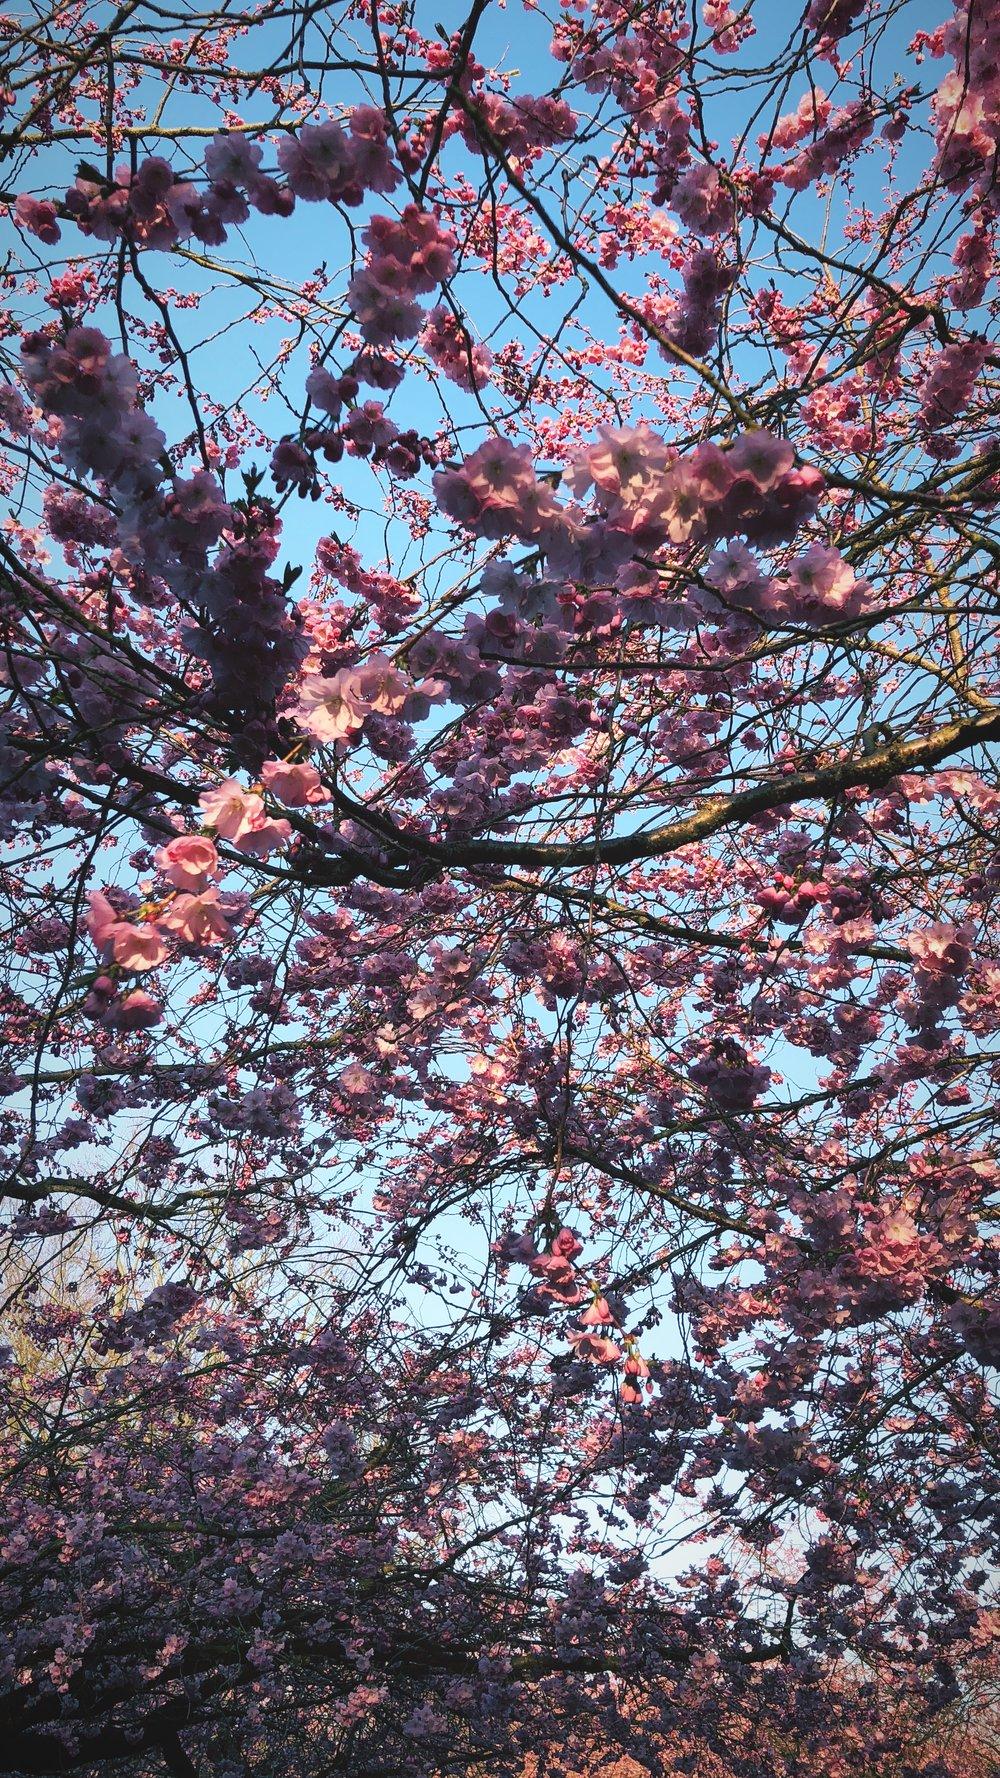 cherryblossom-alantherock.jpg